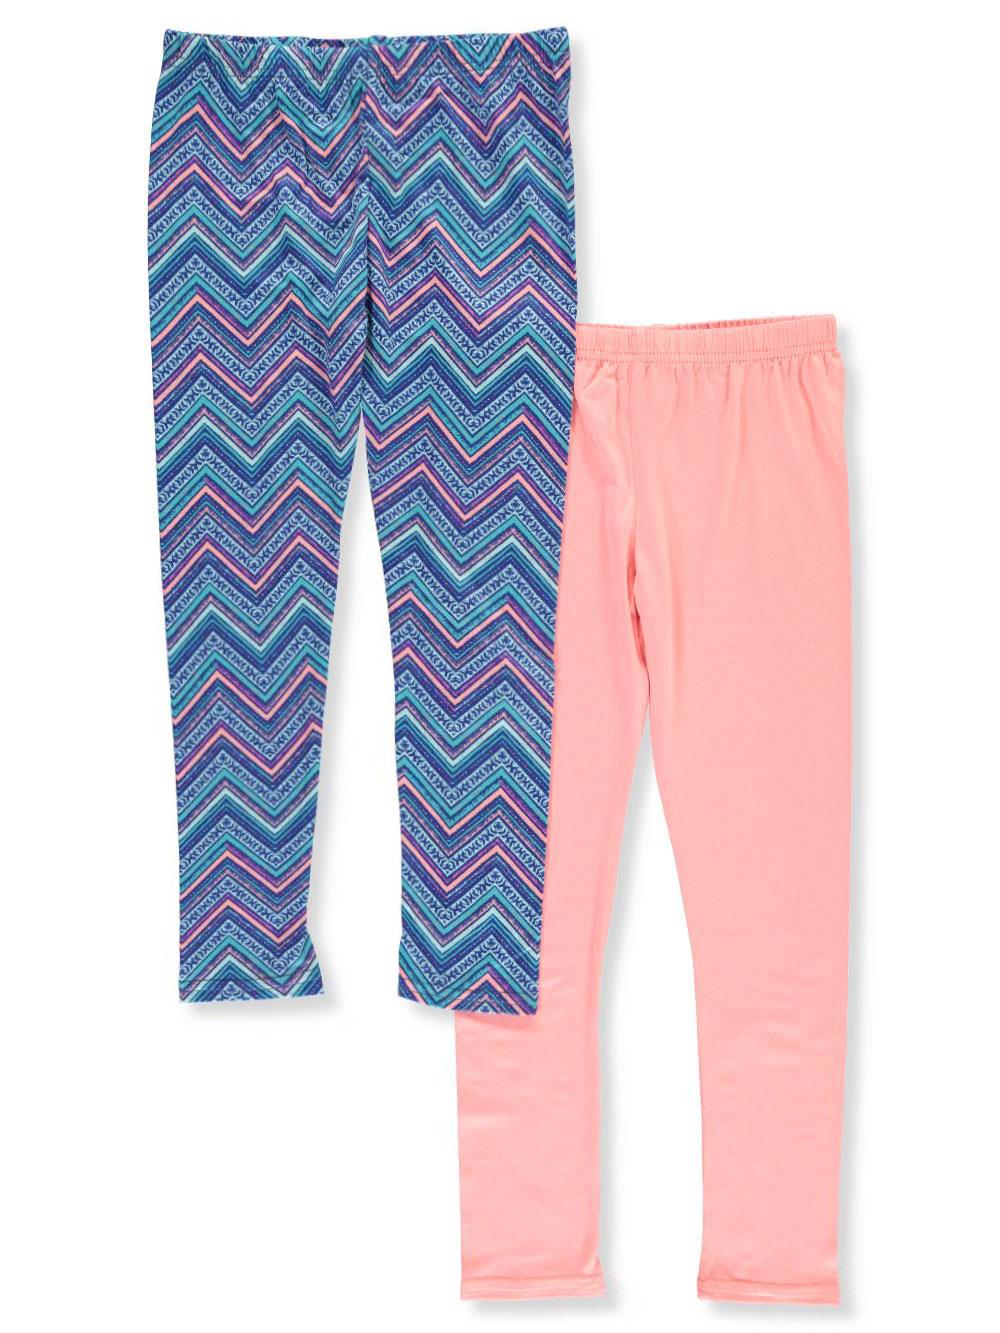 Star Ride Girls 2-Pack Bermuda Shorts